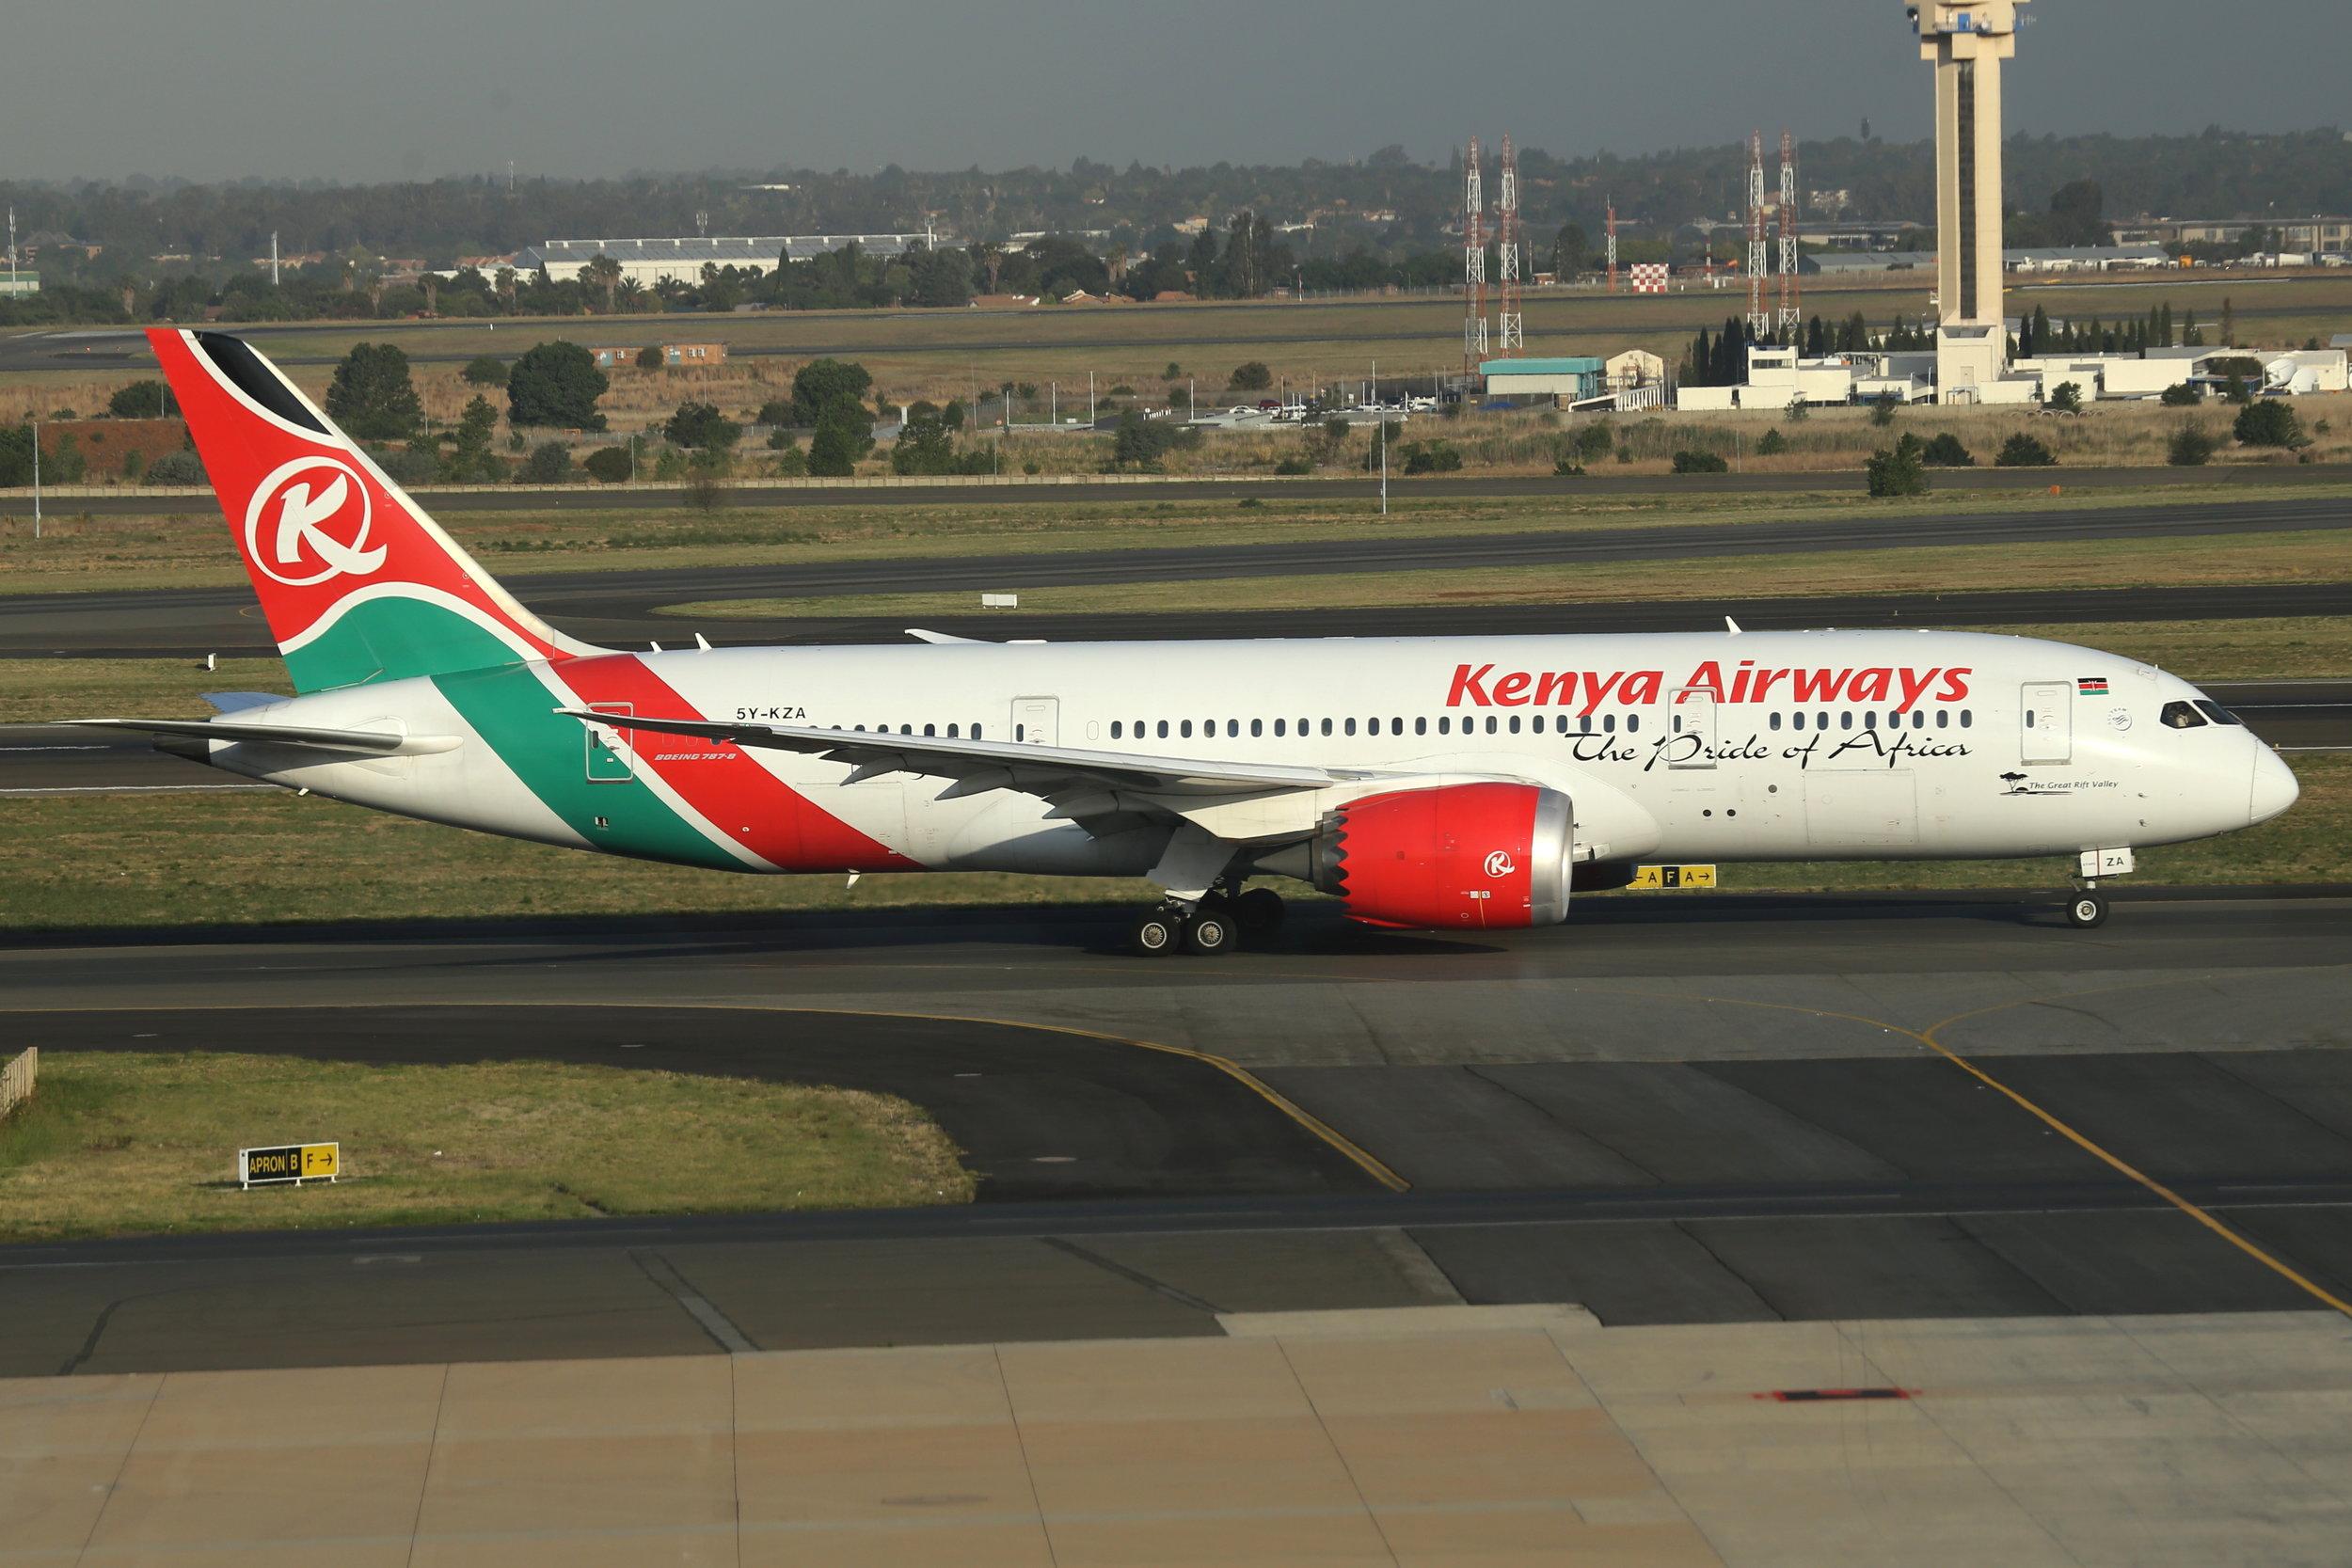 5Y-KZA Kenya Airways B787-8 taken at Johannesburg 7th November 2018 by John Wood